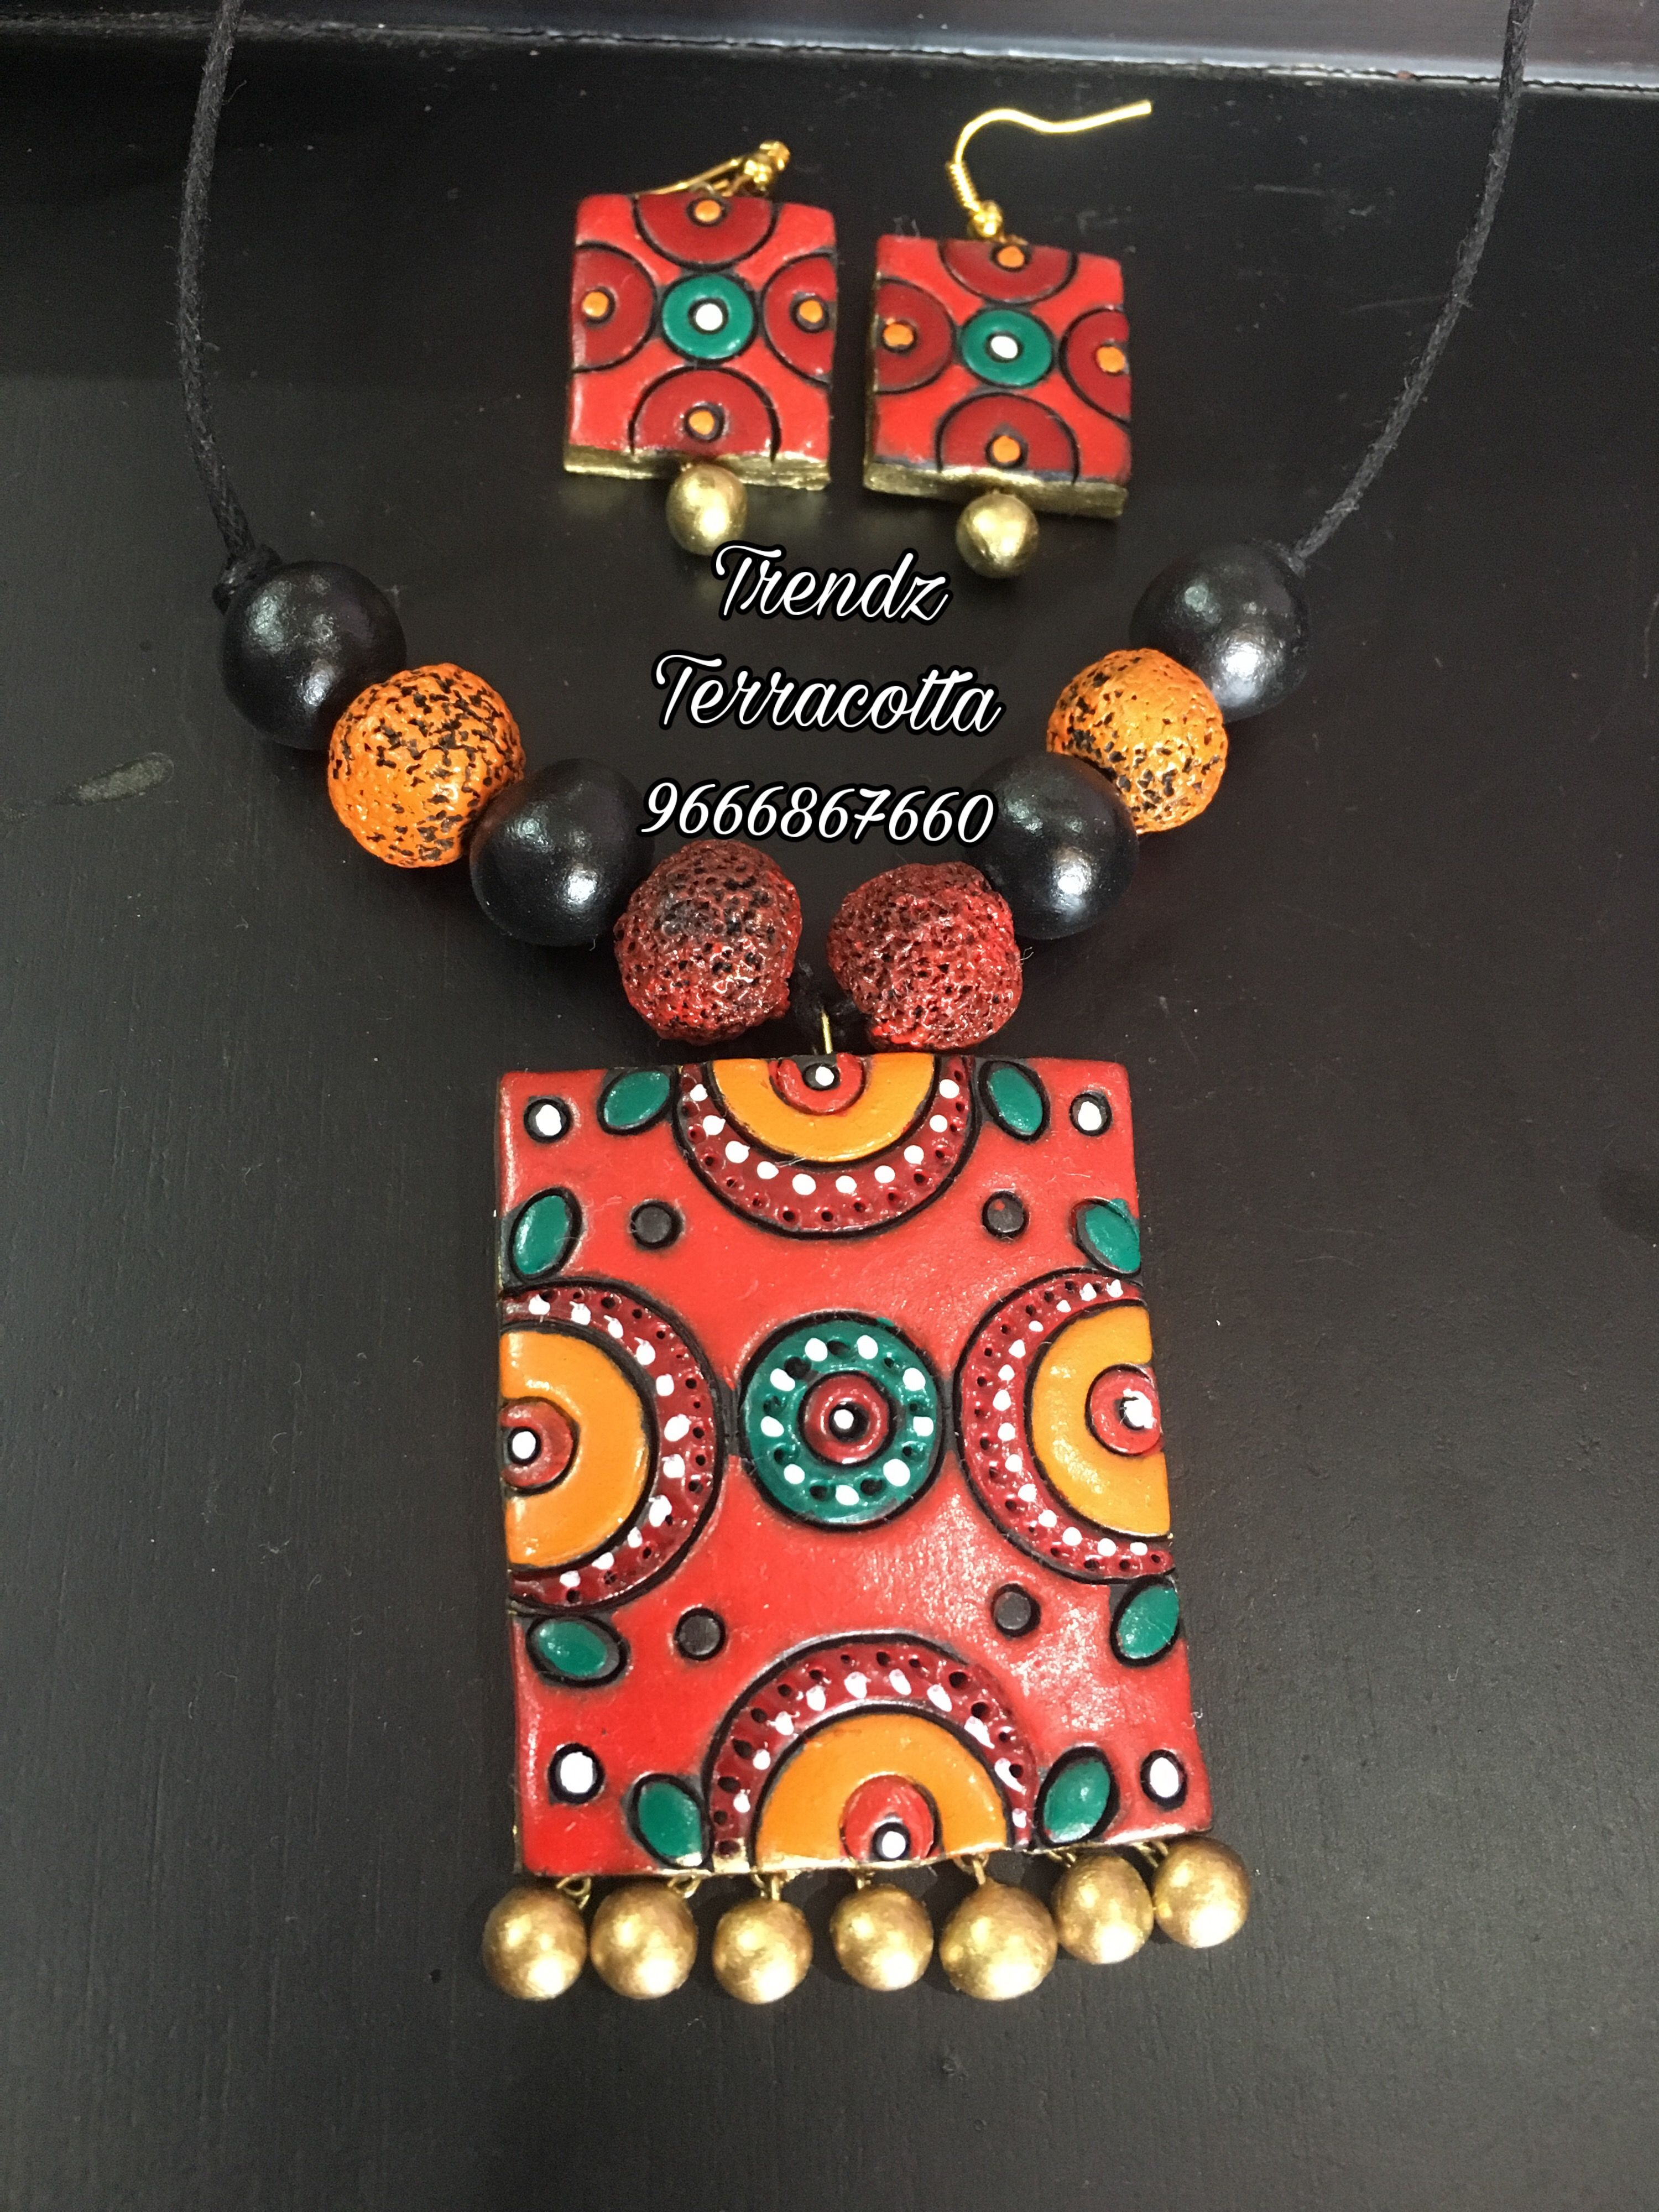 Terracotta Jewellery Https M Facebook Com Trendzbyjayamehta Terracotta Jewellery Making Handmade Jewelry Designs Terracotta Jewellery Designs